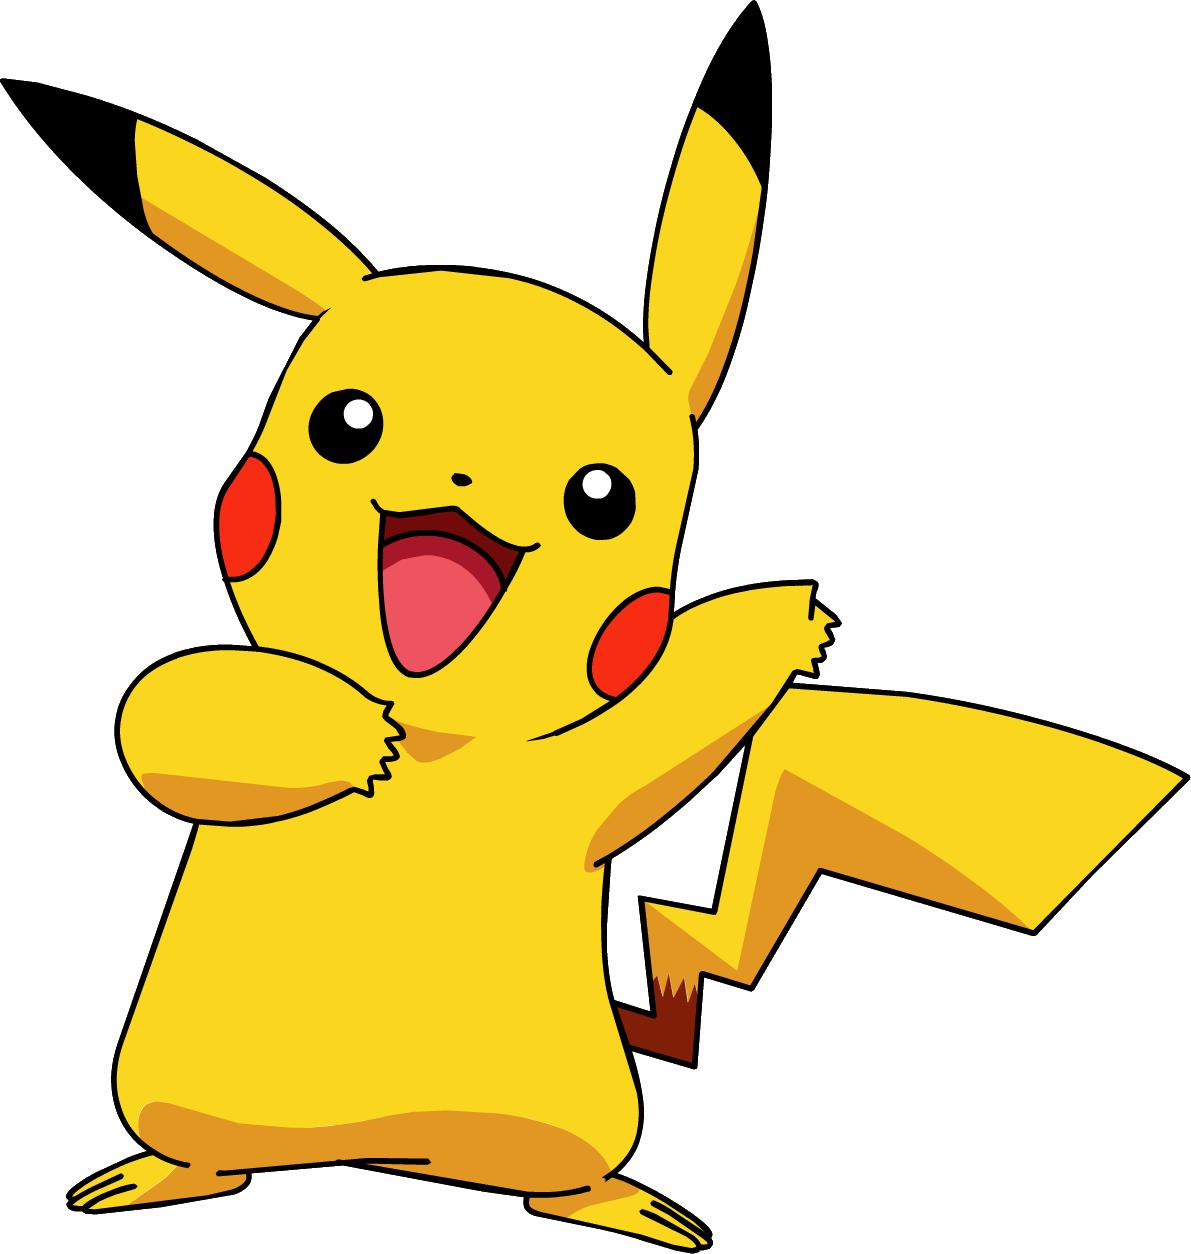 Image - 025Pikachu OS Anime 4.png | Pokémon Wiki | FANDOM Powered By Wikia - Pokemon HD PNG